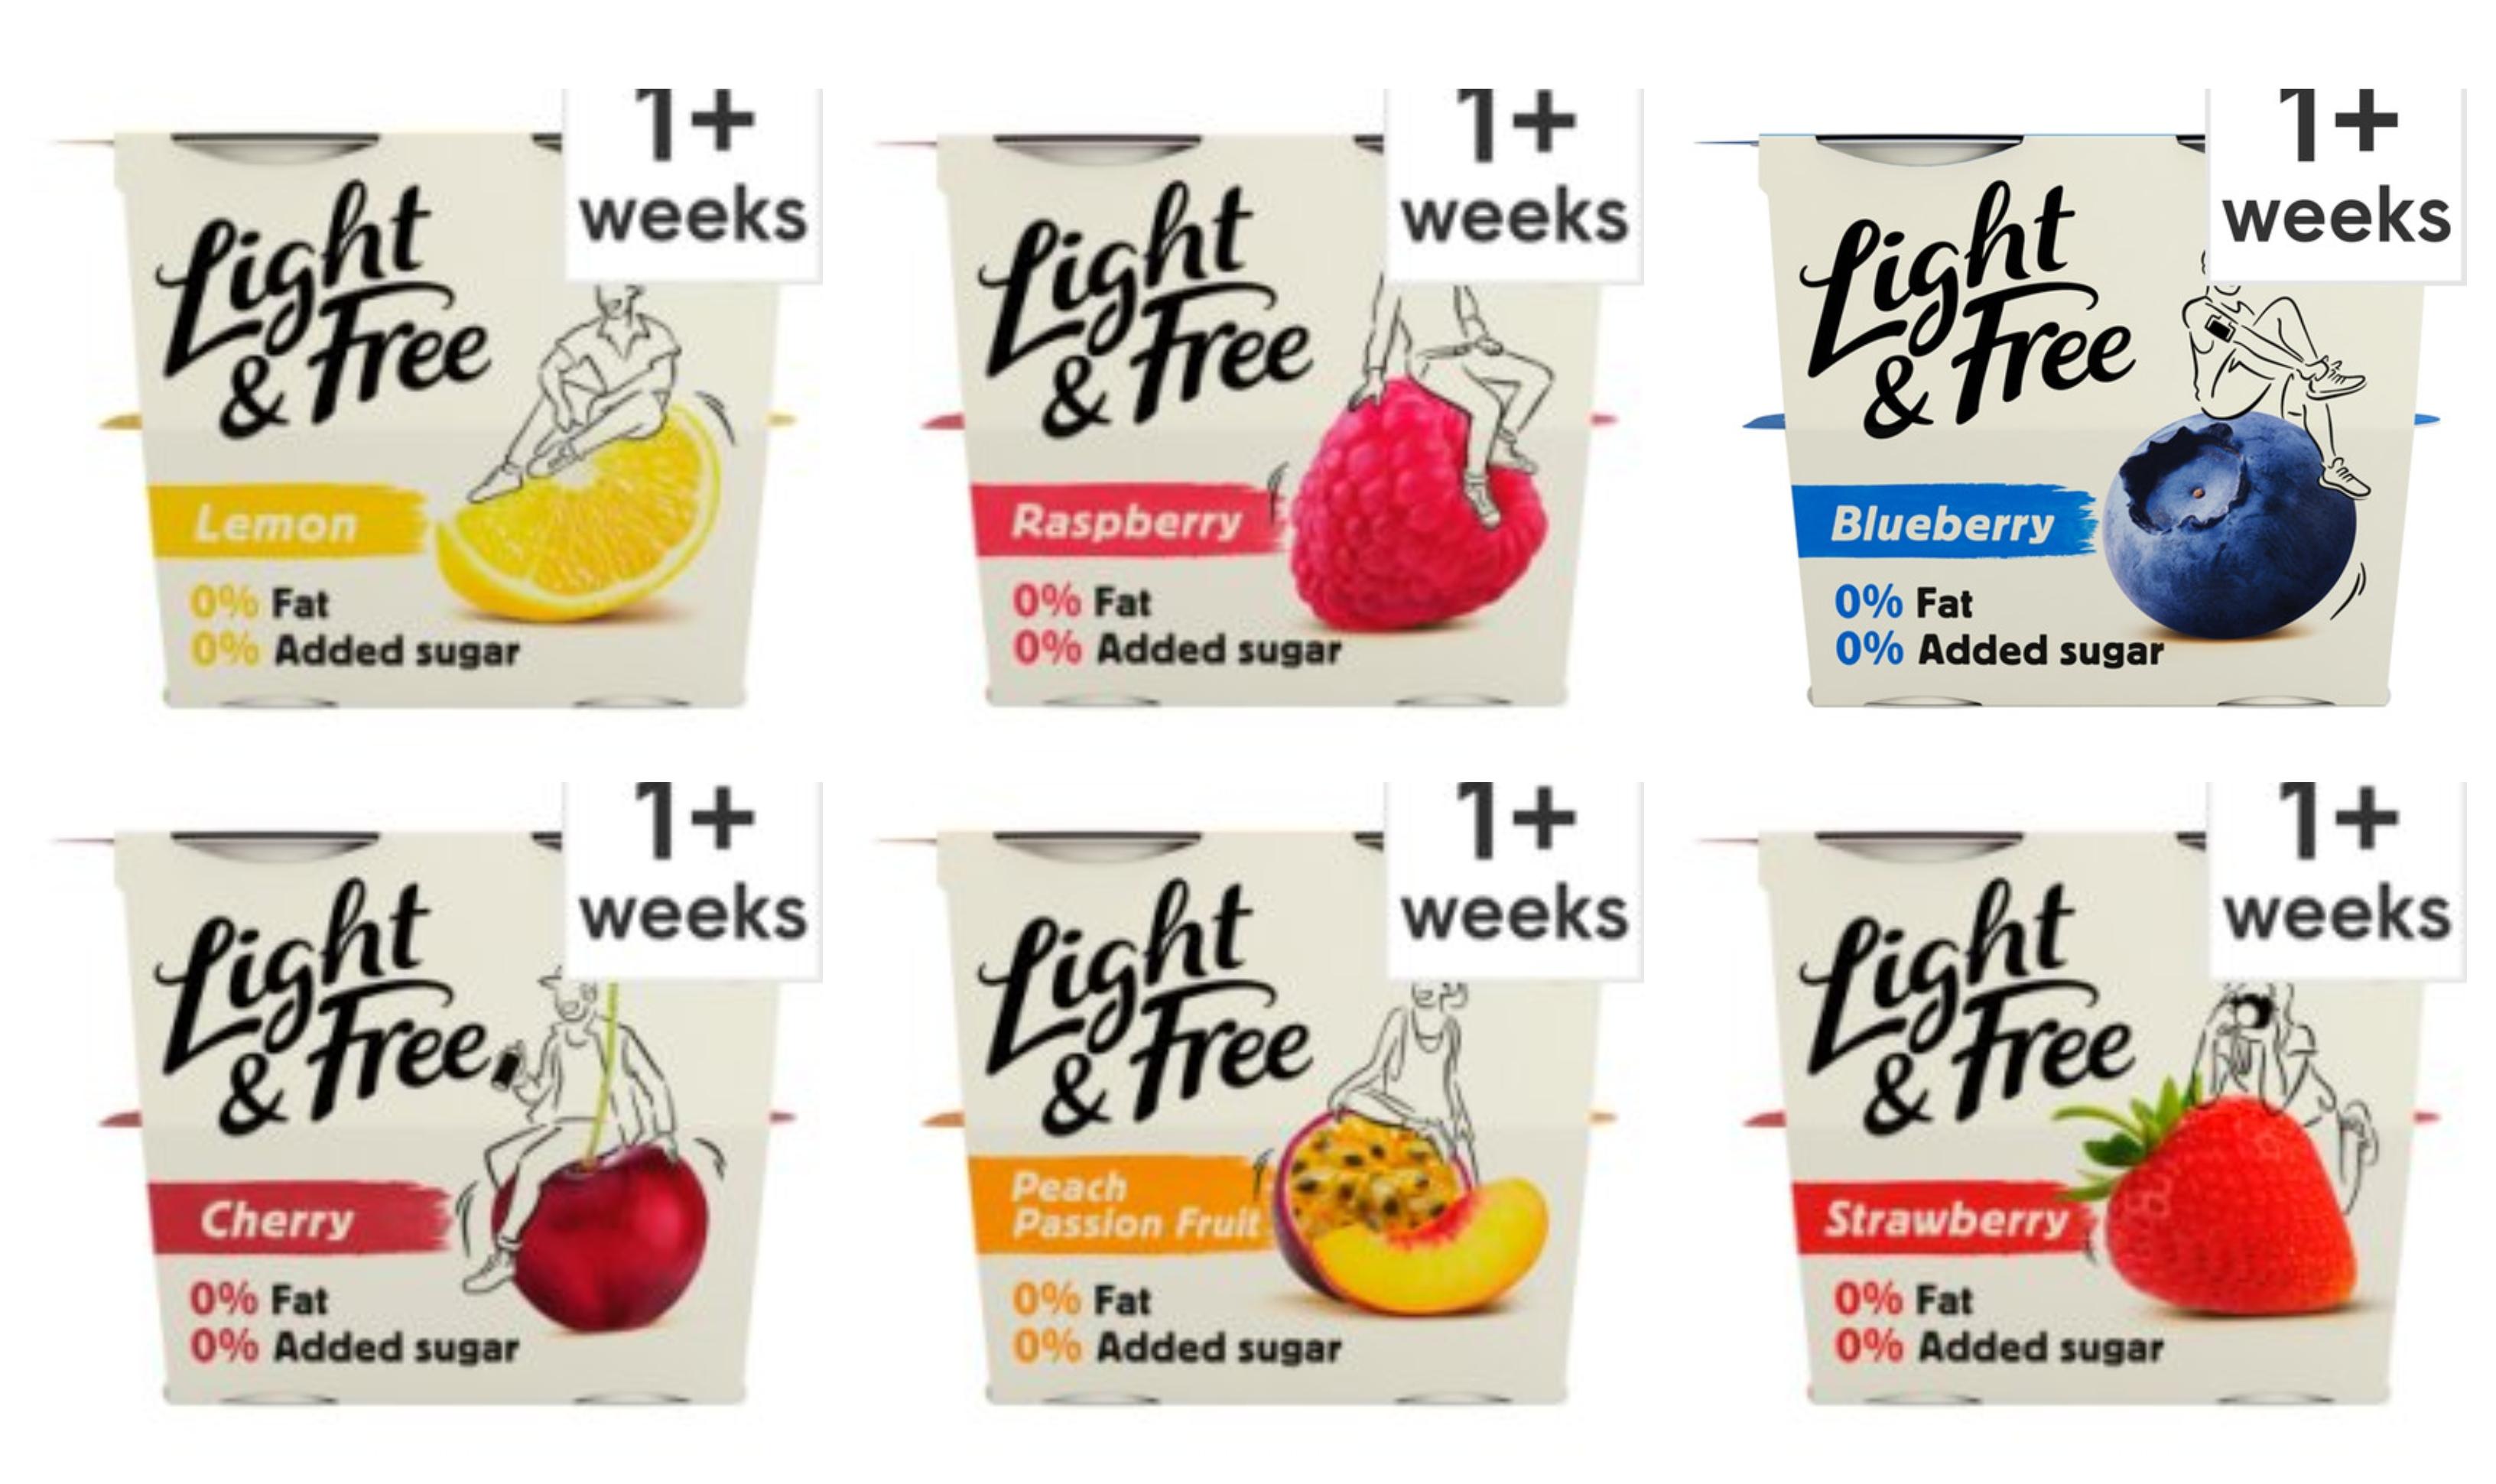 Light & Free Greek Style Yogurt 4X115g ( All Varieties) - £1.00 @ Tesco